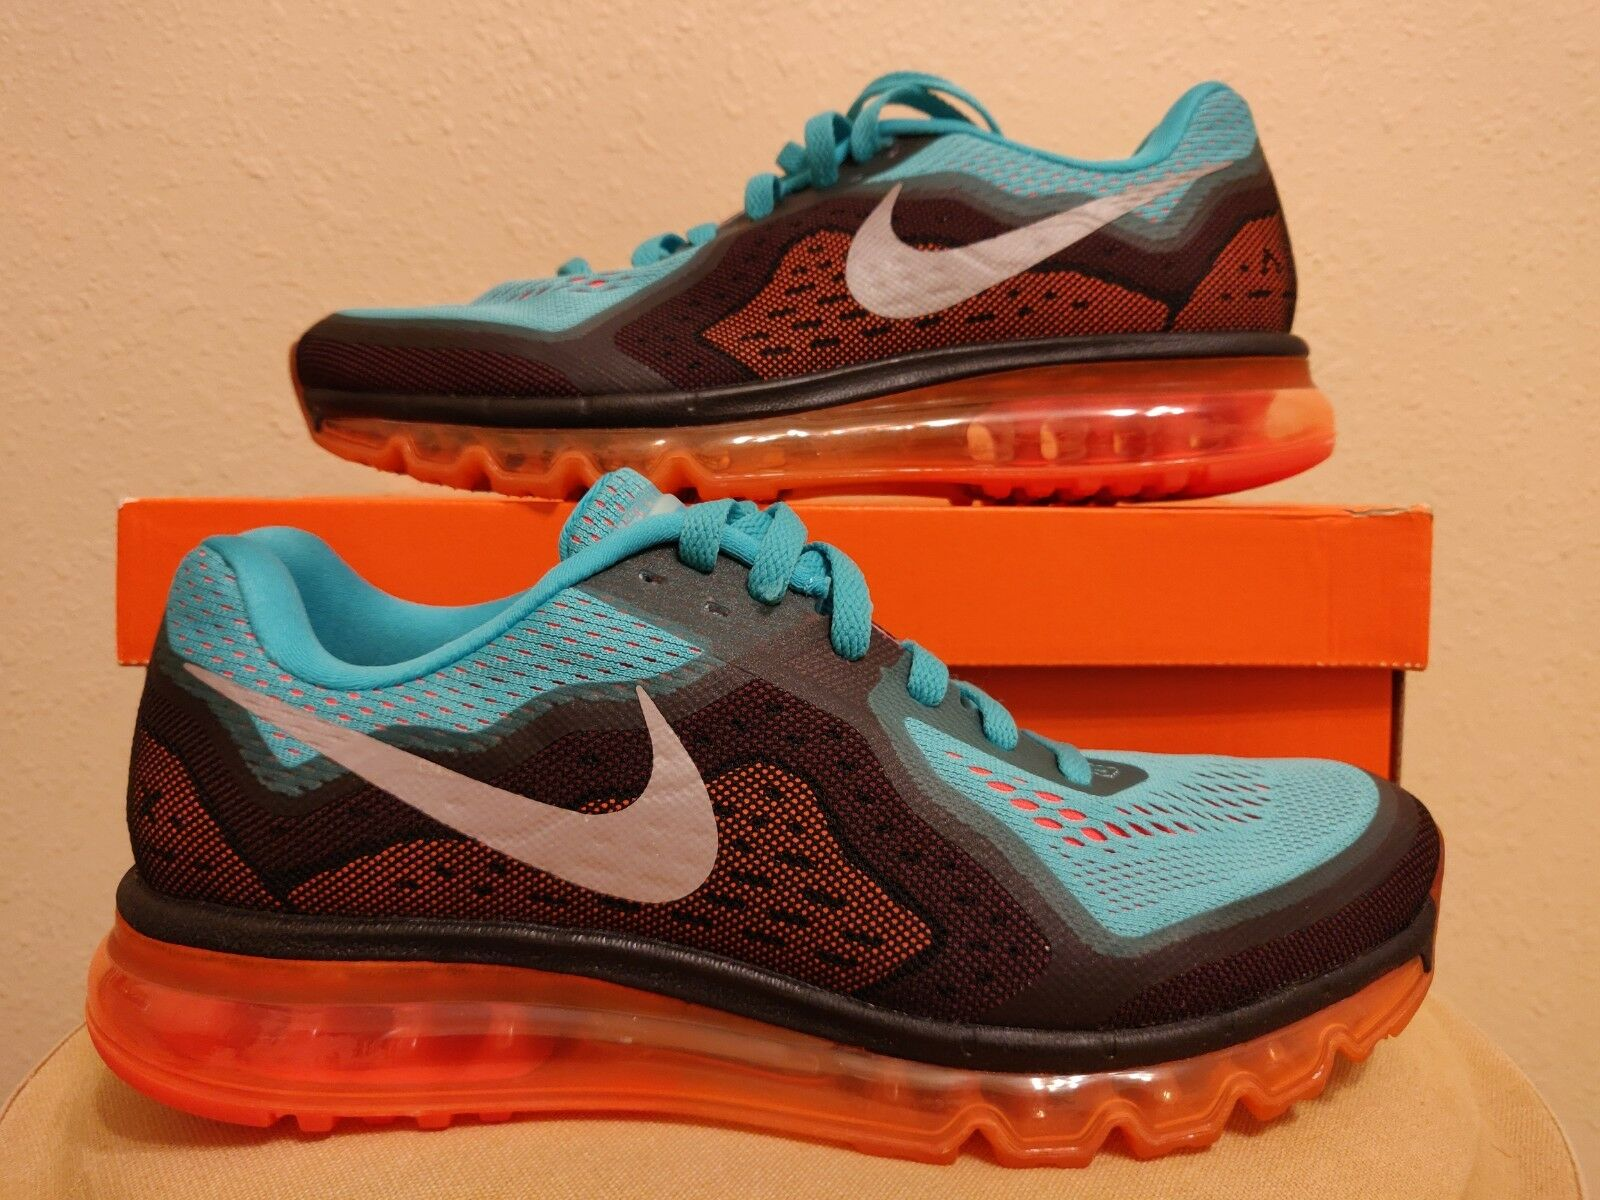 Nike Air Max 2014 Running shoes Hyper Jade orange Black (621077-302) size 10